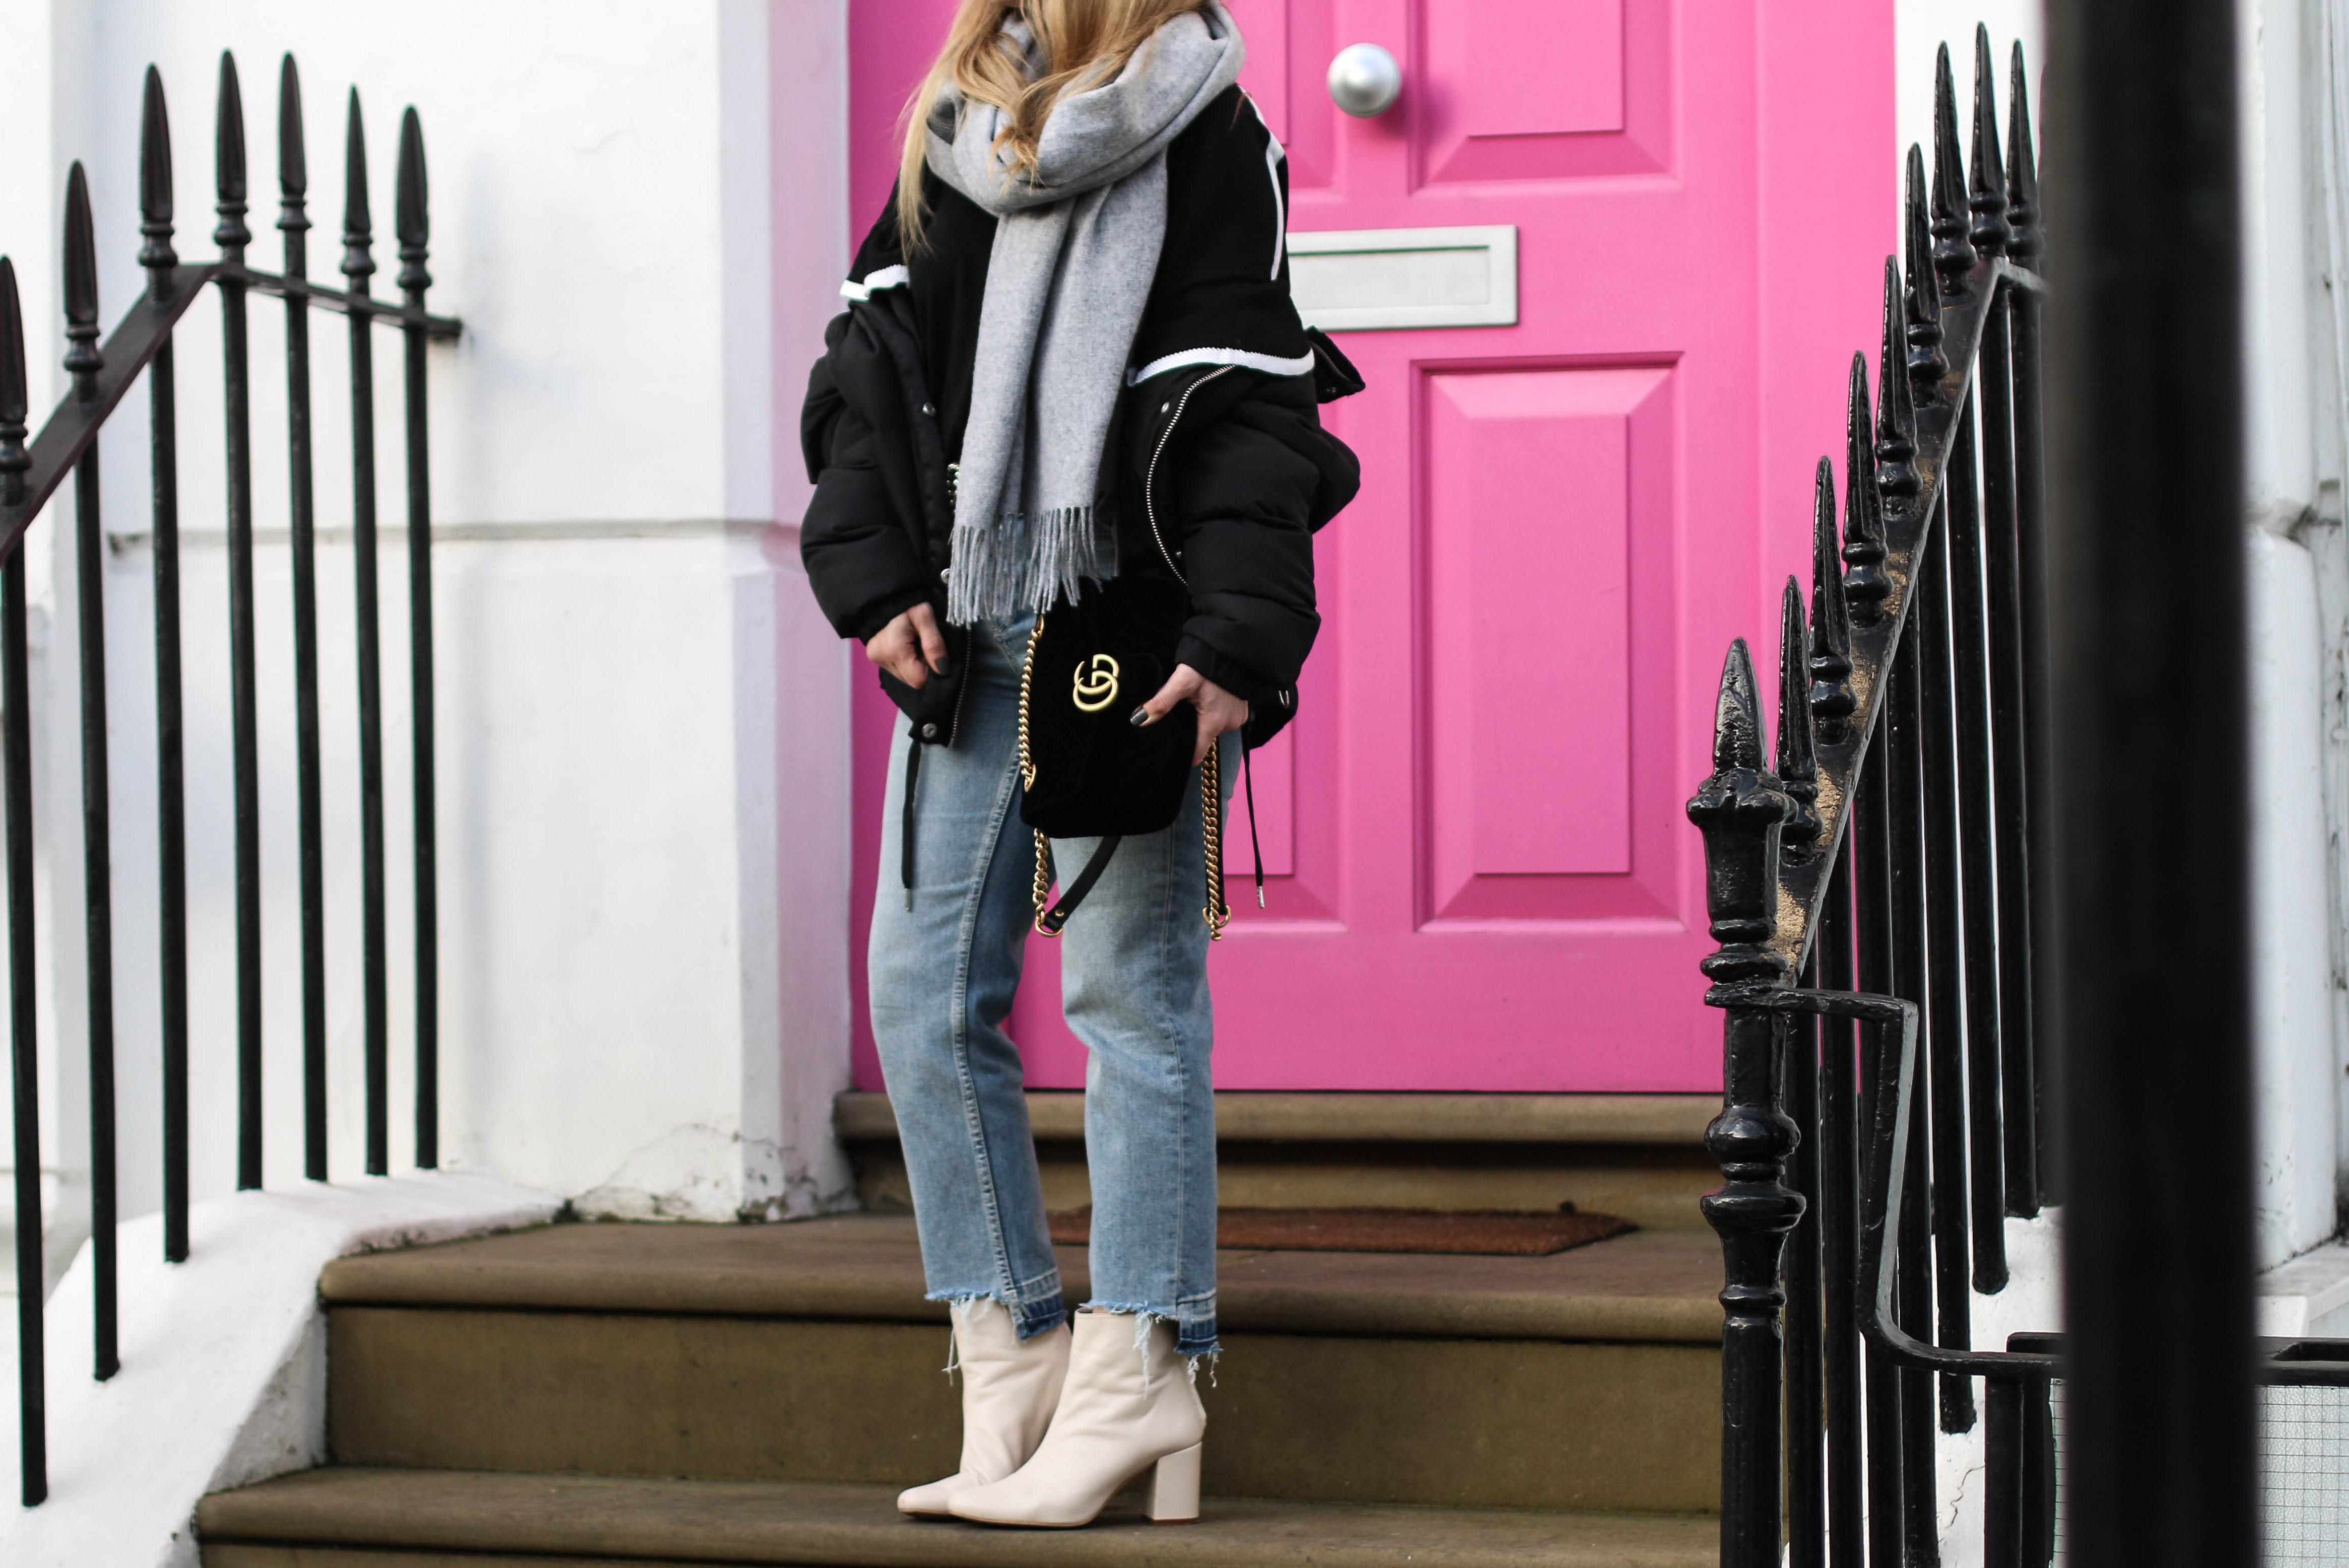 Gucci GG Marmont Velvet Bag pink door Fashiontwinstinct